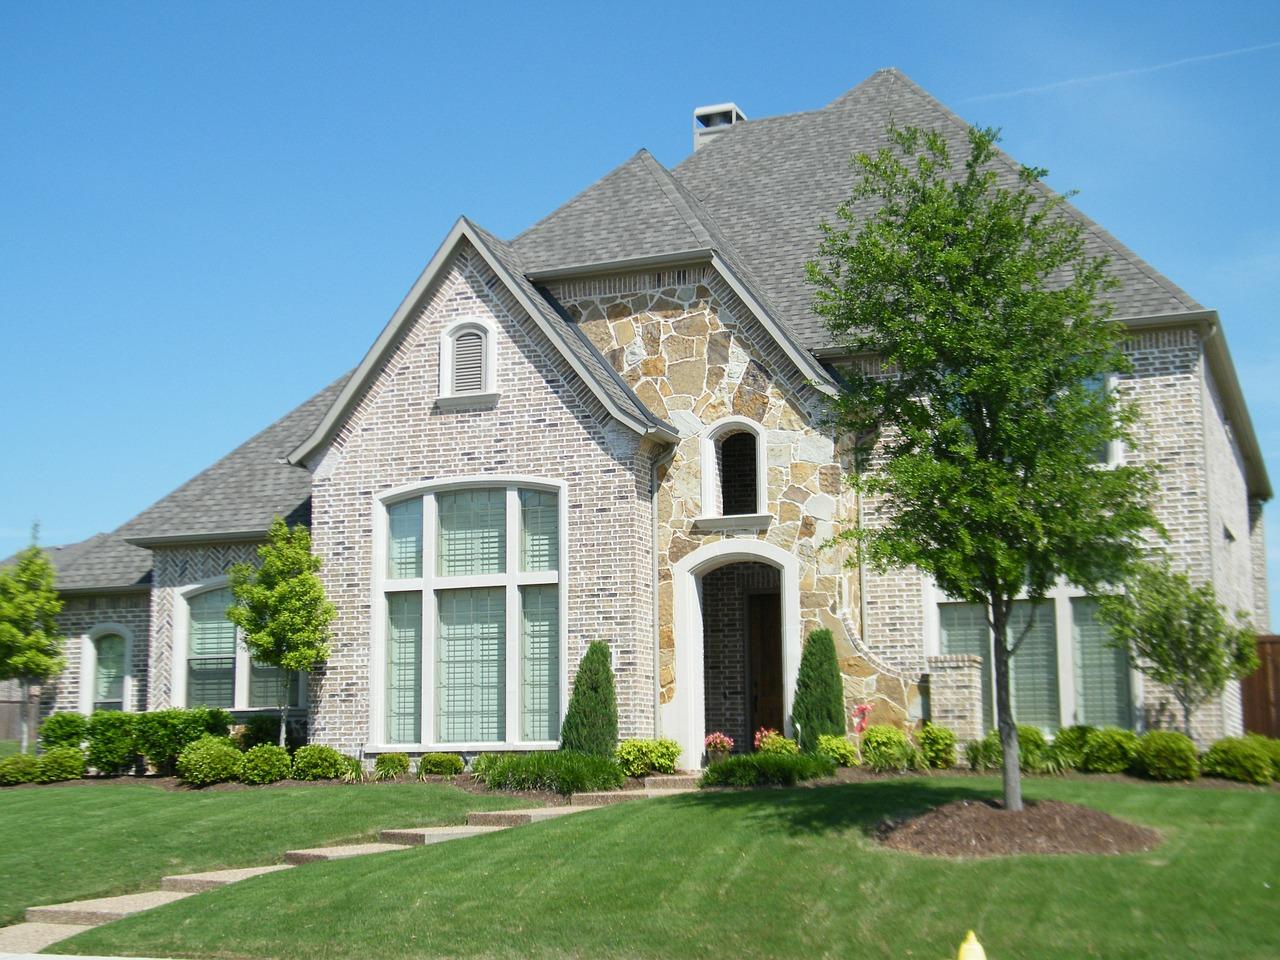 brick-house-299766_1280